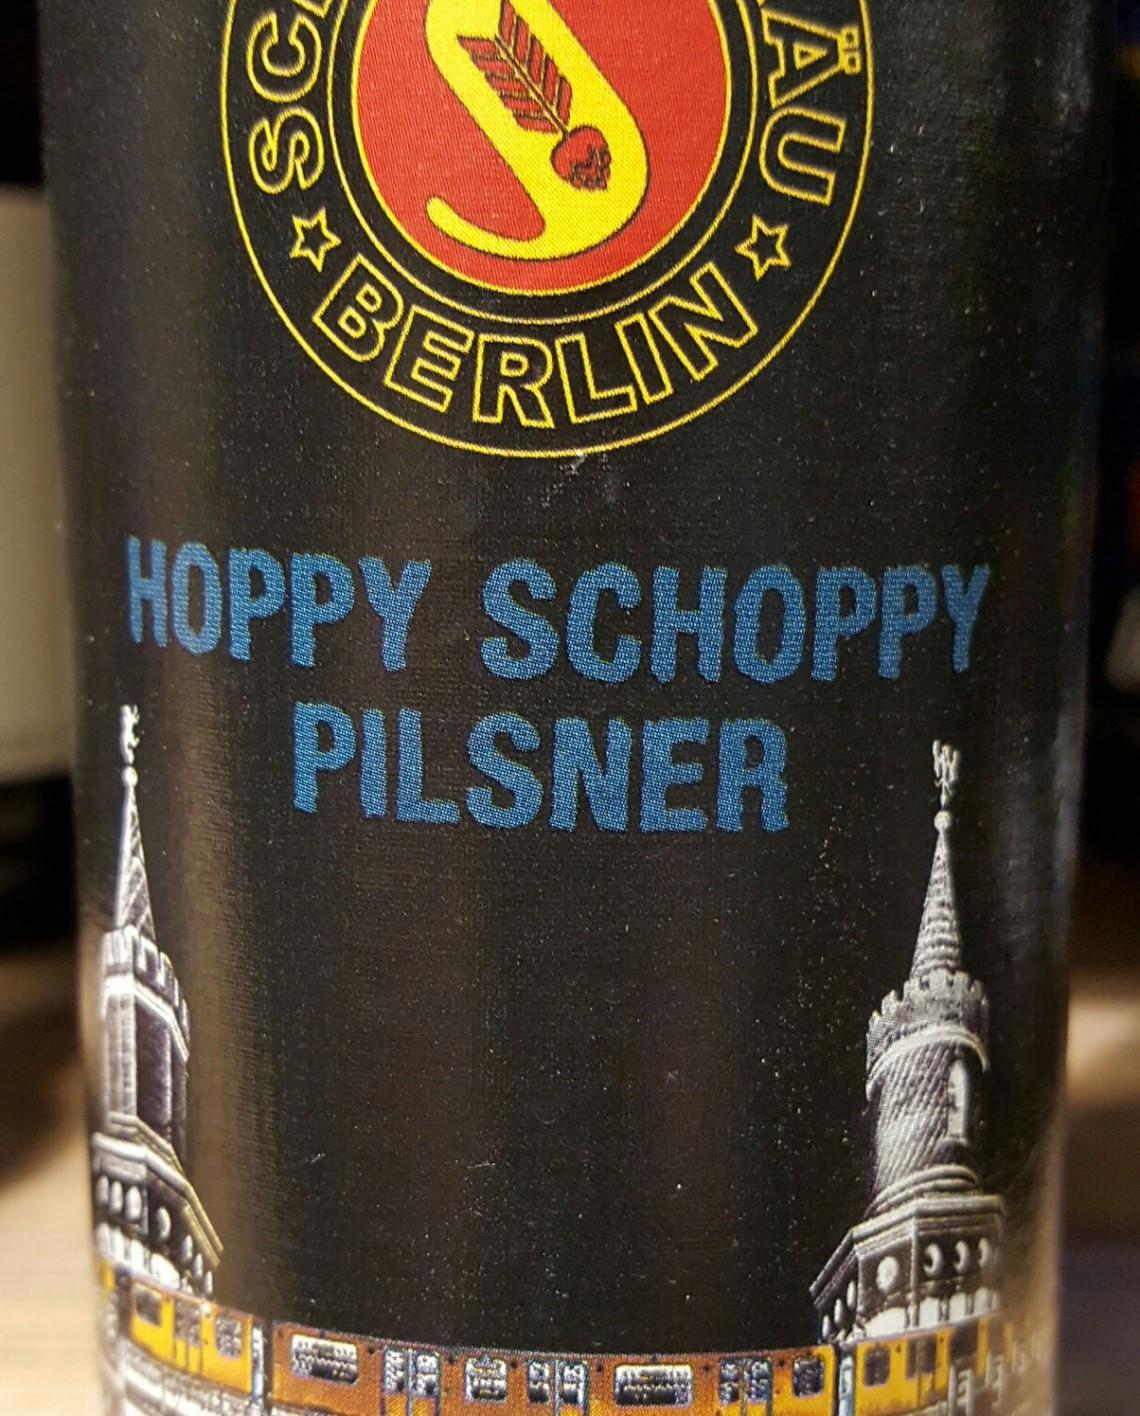 craftbeer-dealer.com_schoppe_bräu_hoppy_schoppy_pilsner